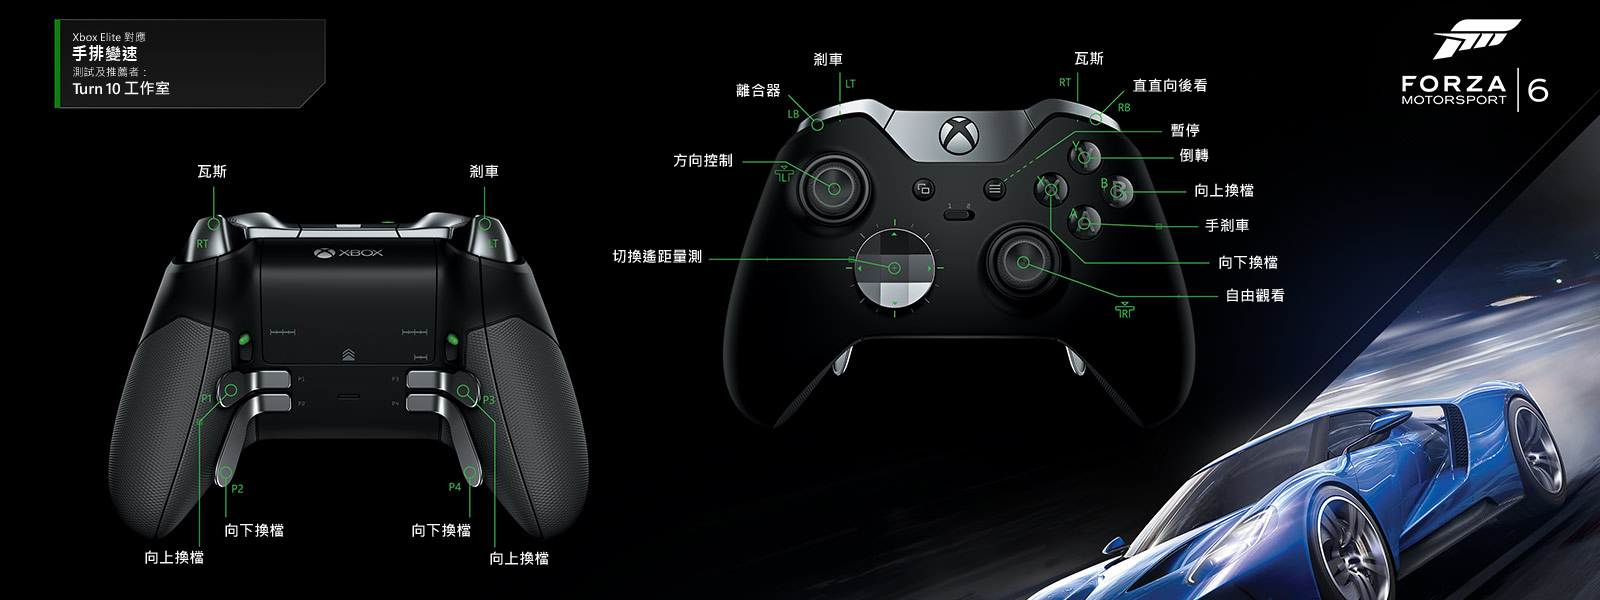 Forza Motorsport 6 – Manual Transmission Elite 配對功能